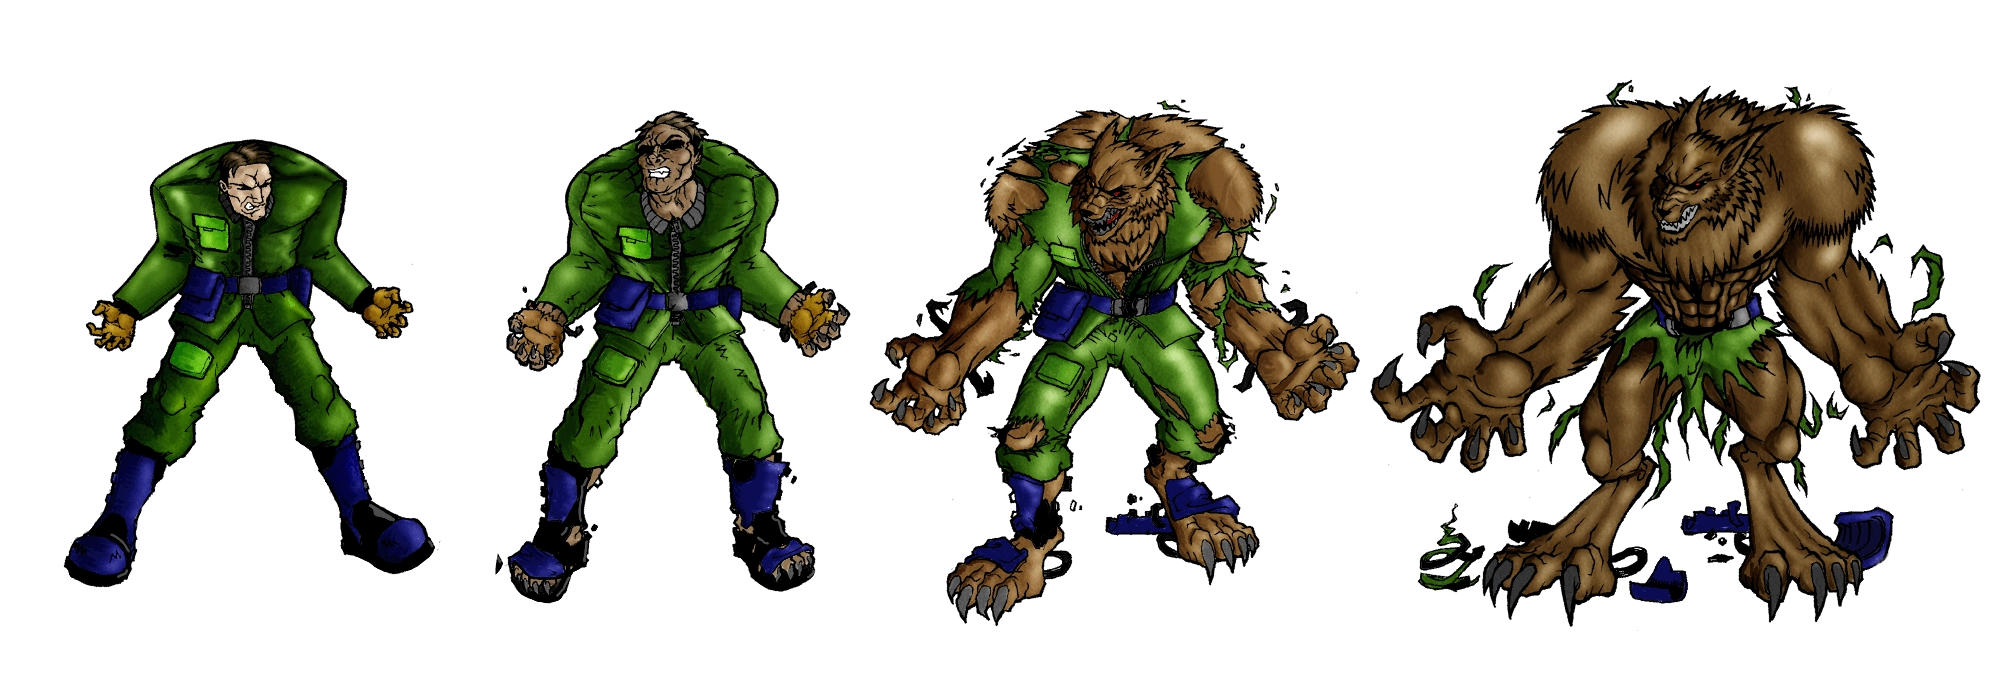 Werewolf Cartoon Transformation Comic | www.imgkid.com ...